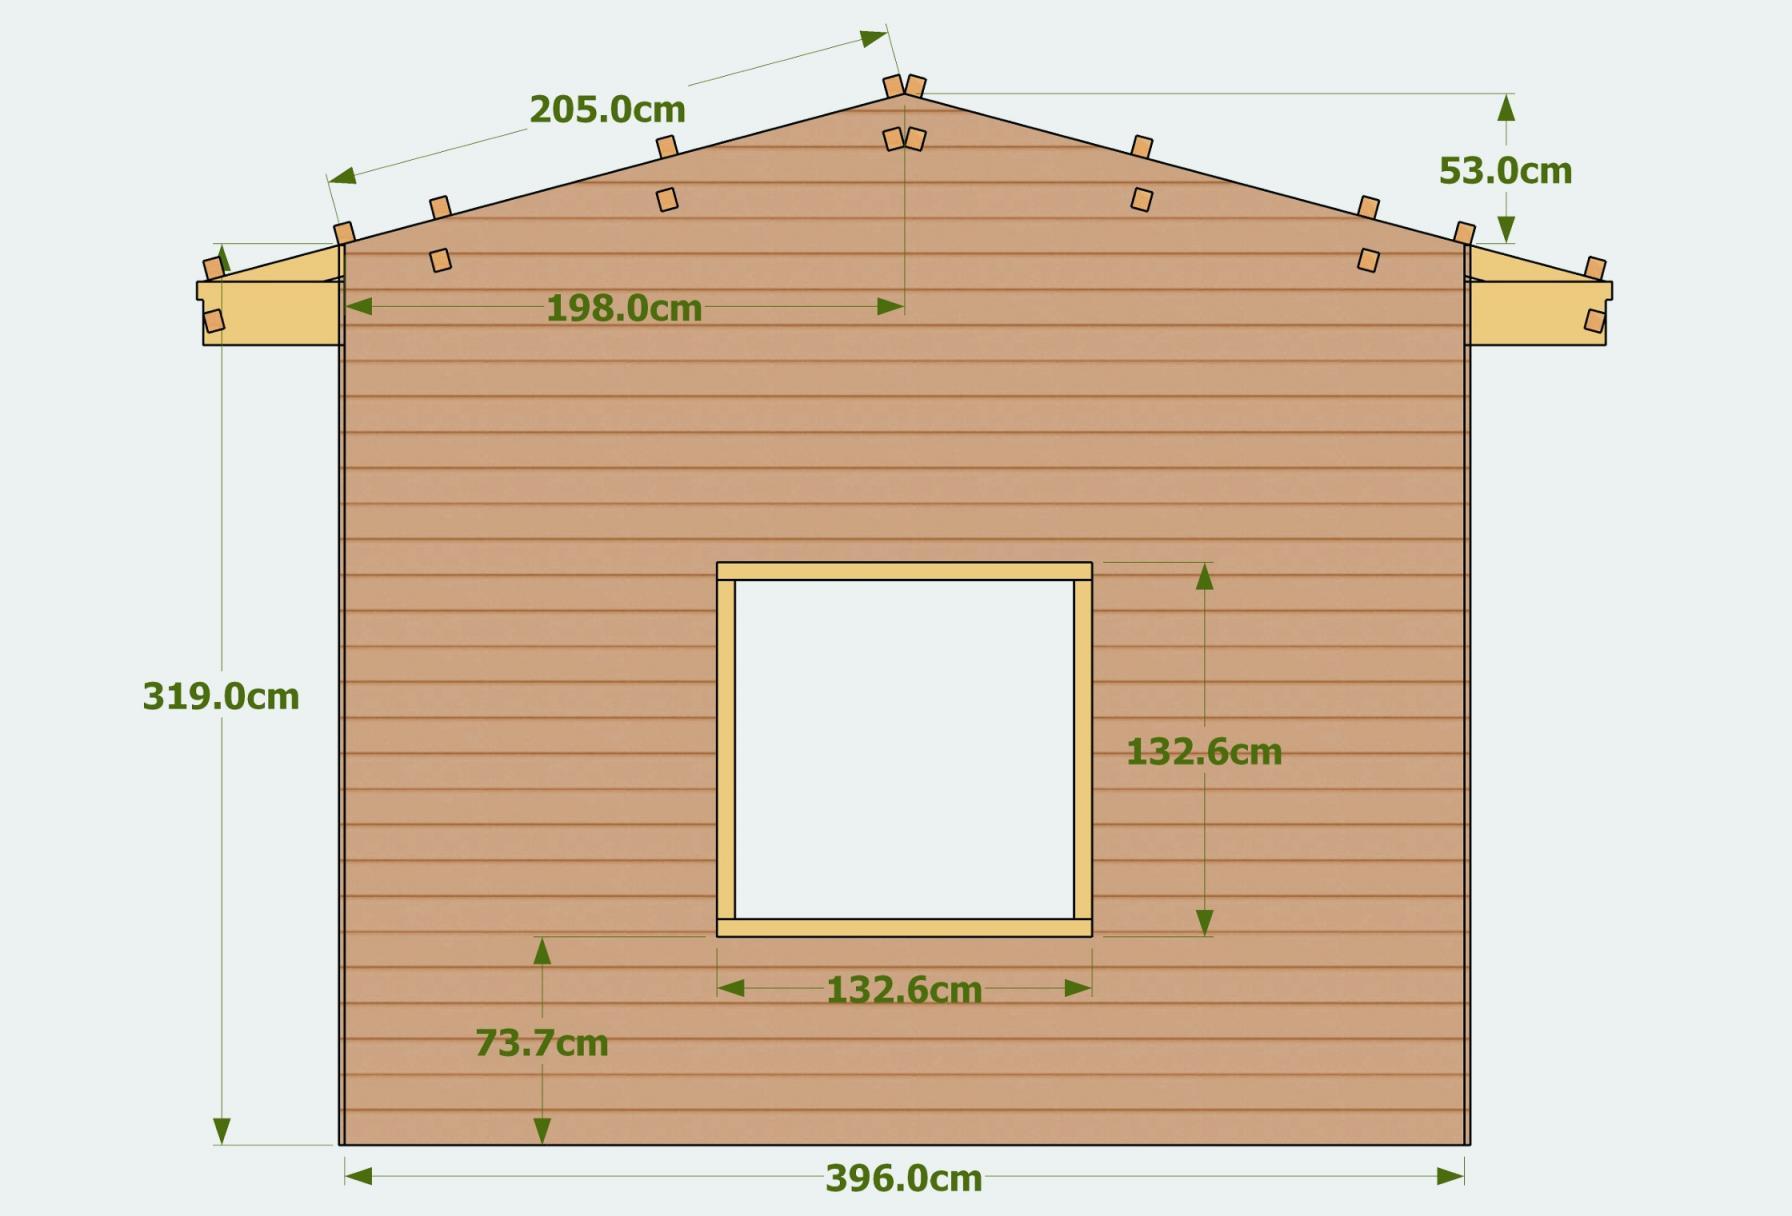 Serre De Jardin Brico Depot Élégant Galerie Abris De Jardin Avec toit En Tuiles Fresh 29 Abris De Jardin Brico